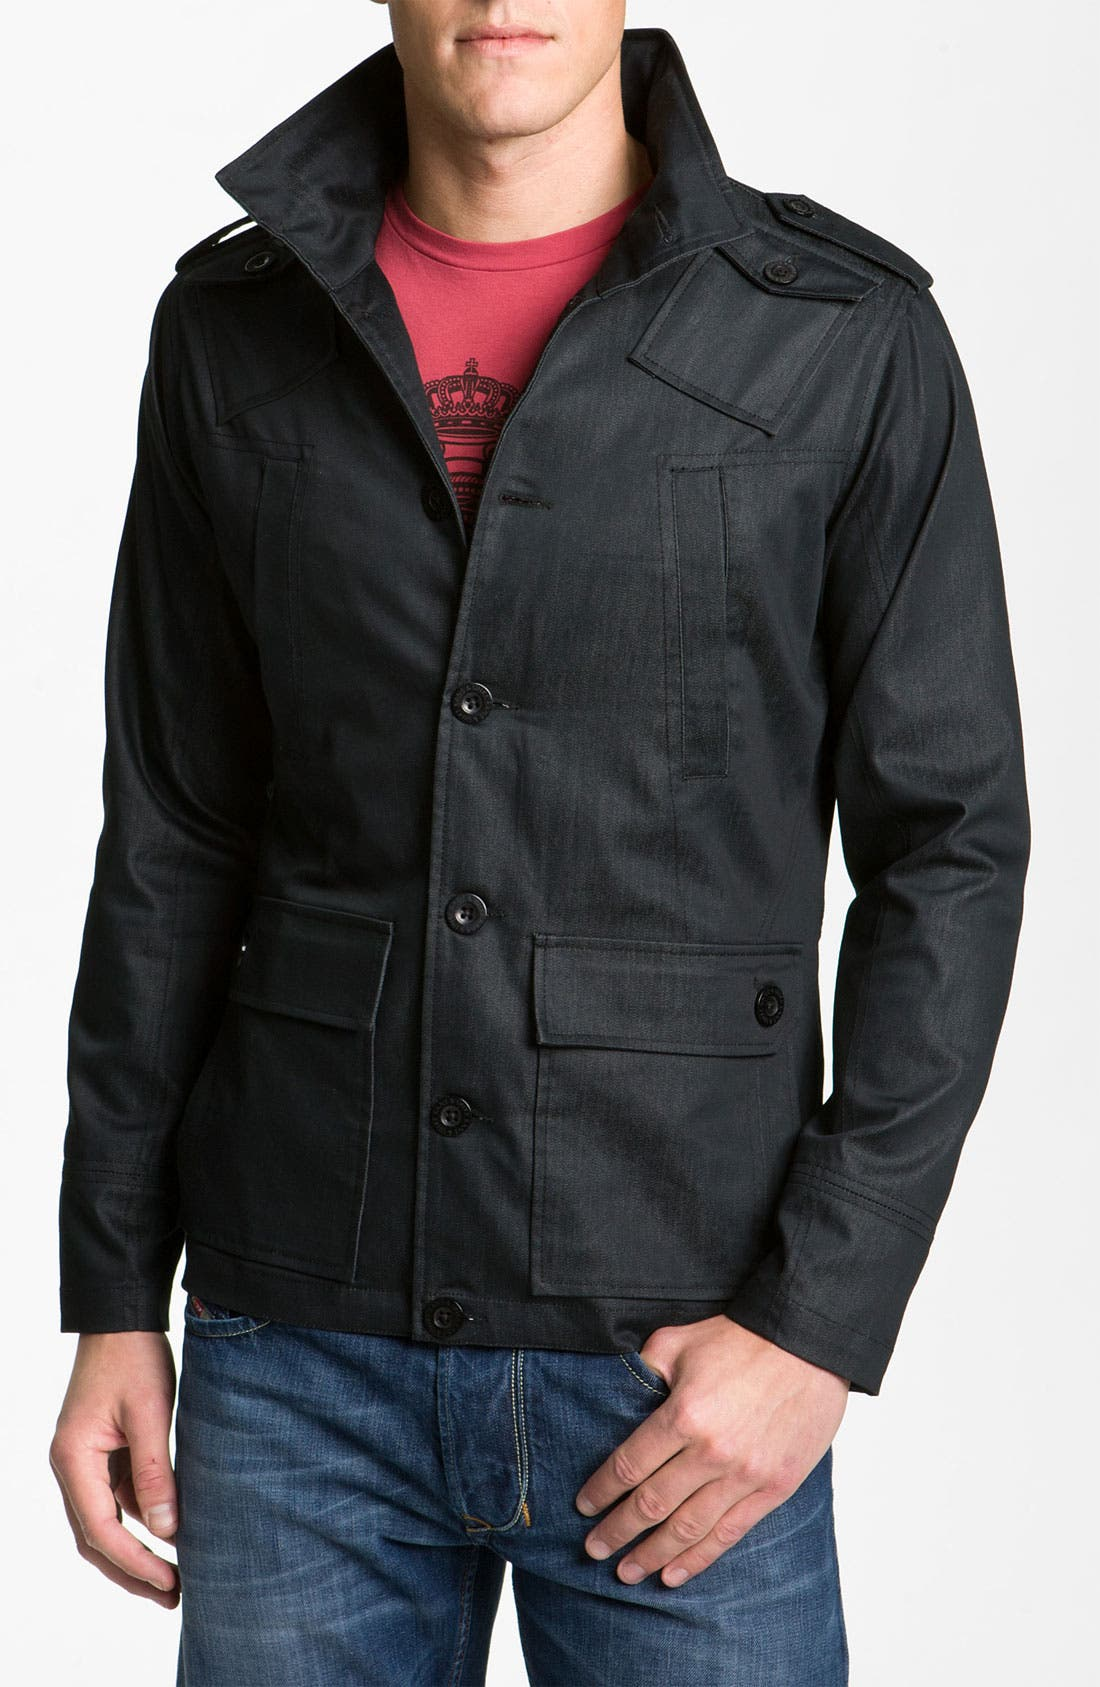 Alternate Image 1 Selected - Kane & Unke Trim Fit Military Jacket